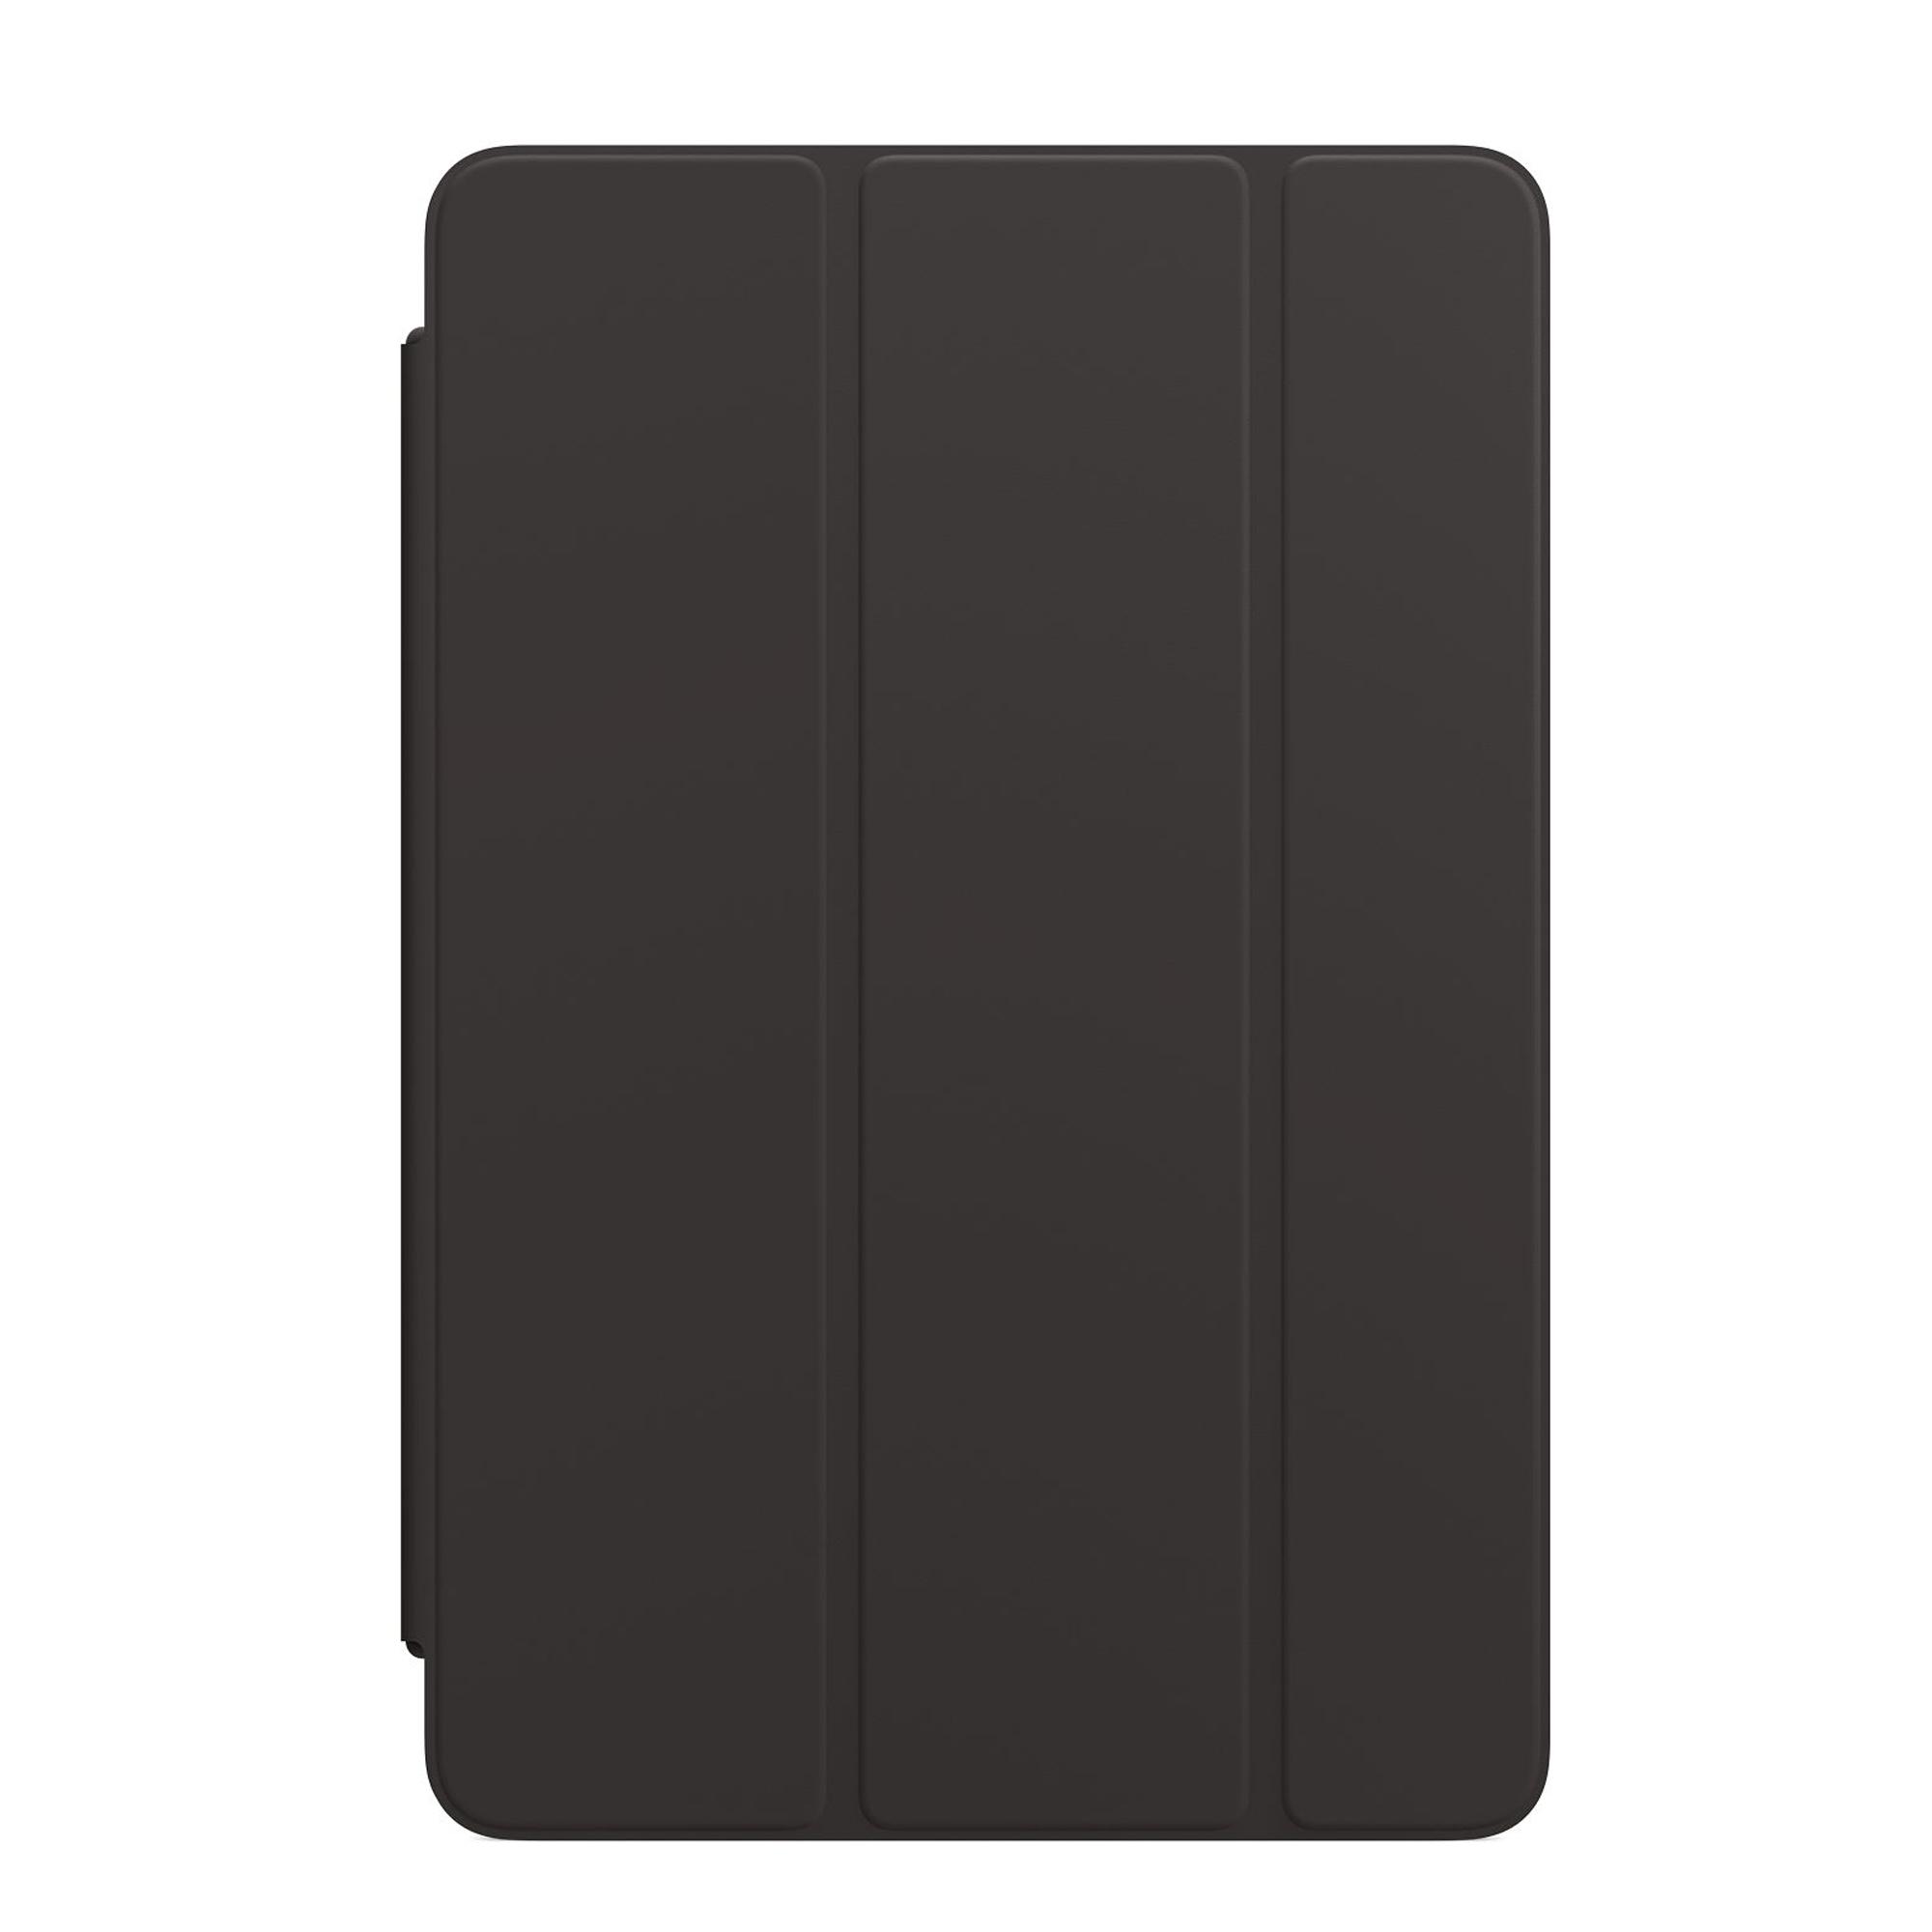 Apple 정품 iPad Smart Cover, Black